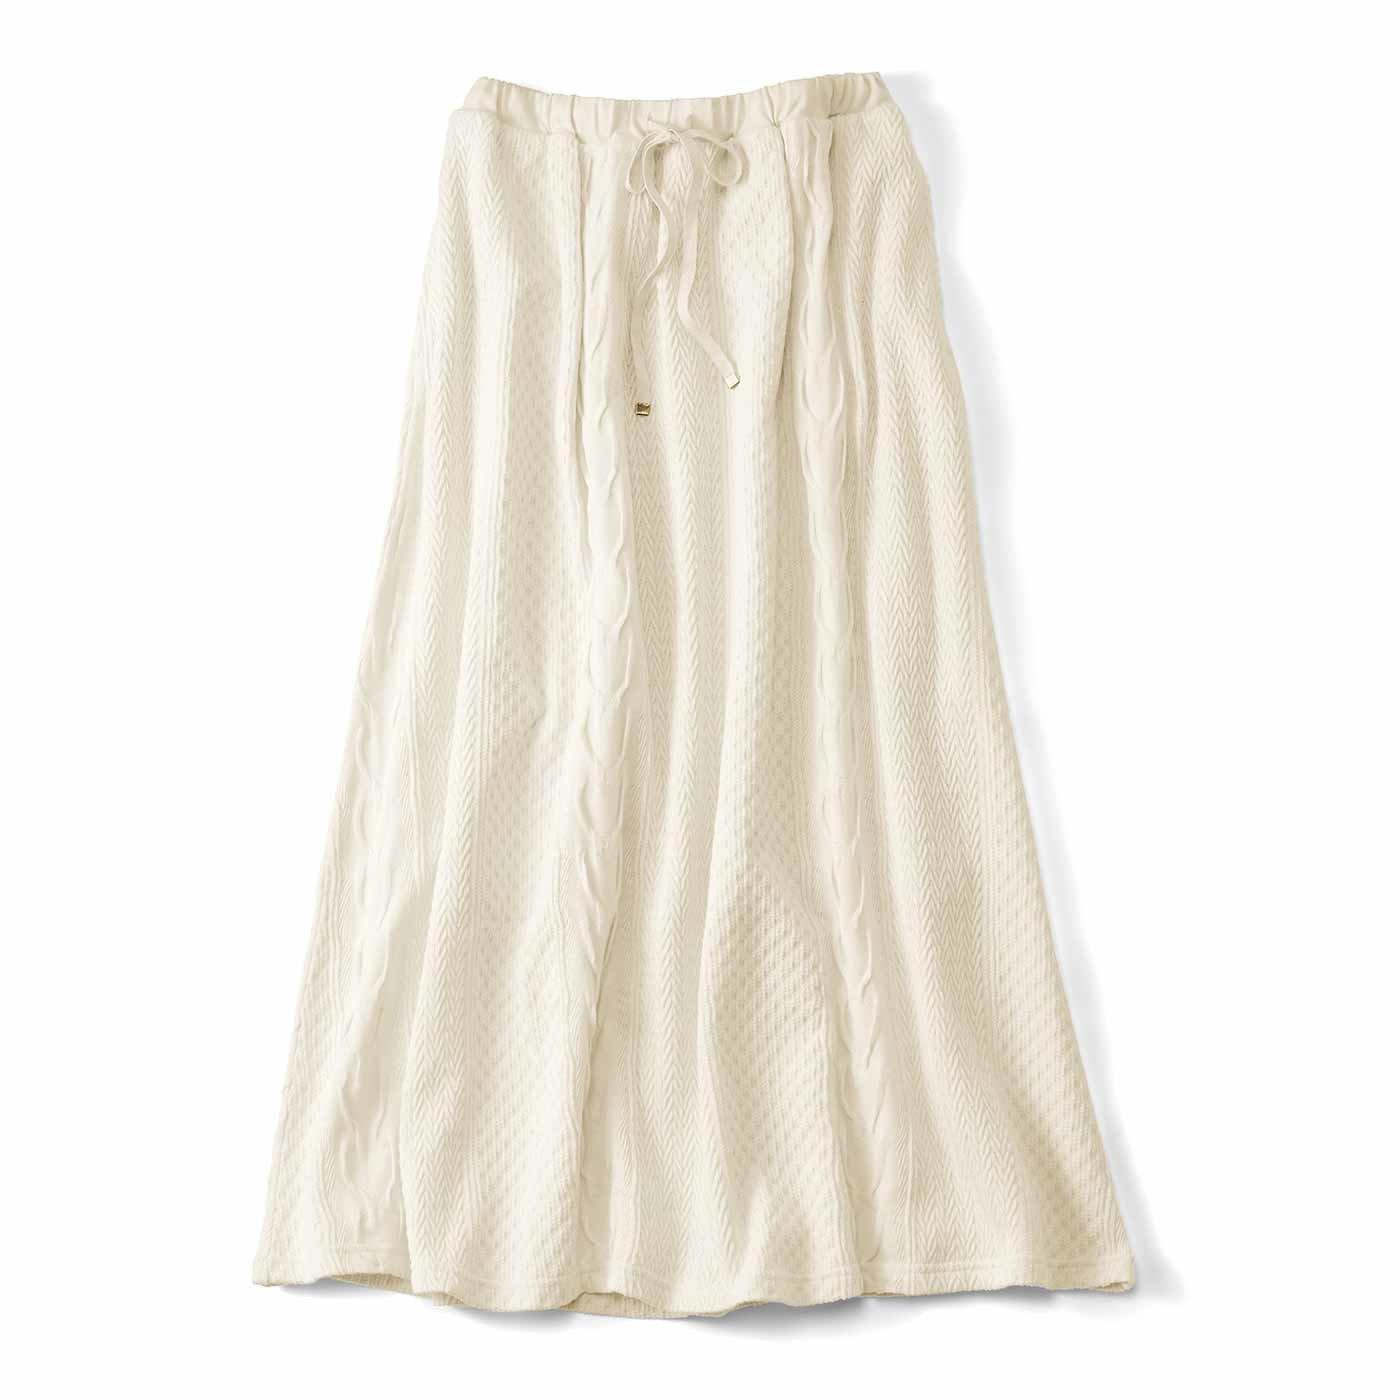 Live love cottonプロジェクト リブ イン コンフォート 編み柄が素敵なオーガニックコットンロングスカート〈アイボリー〉